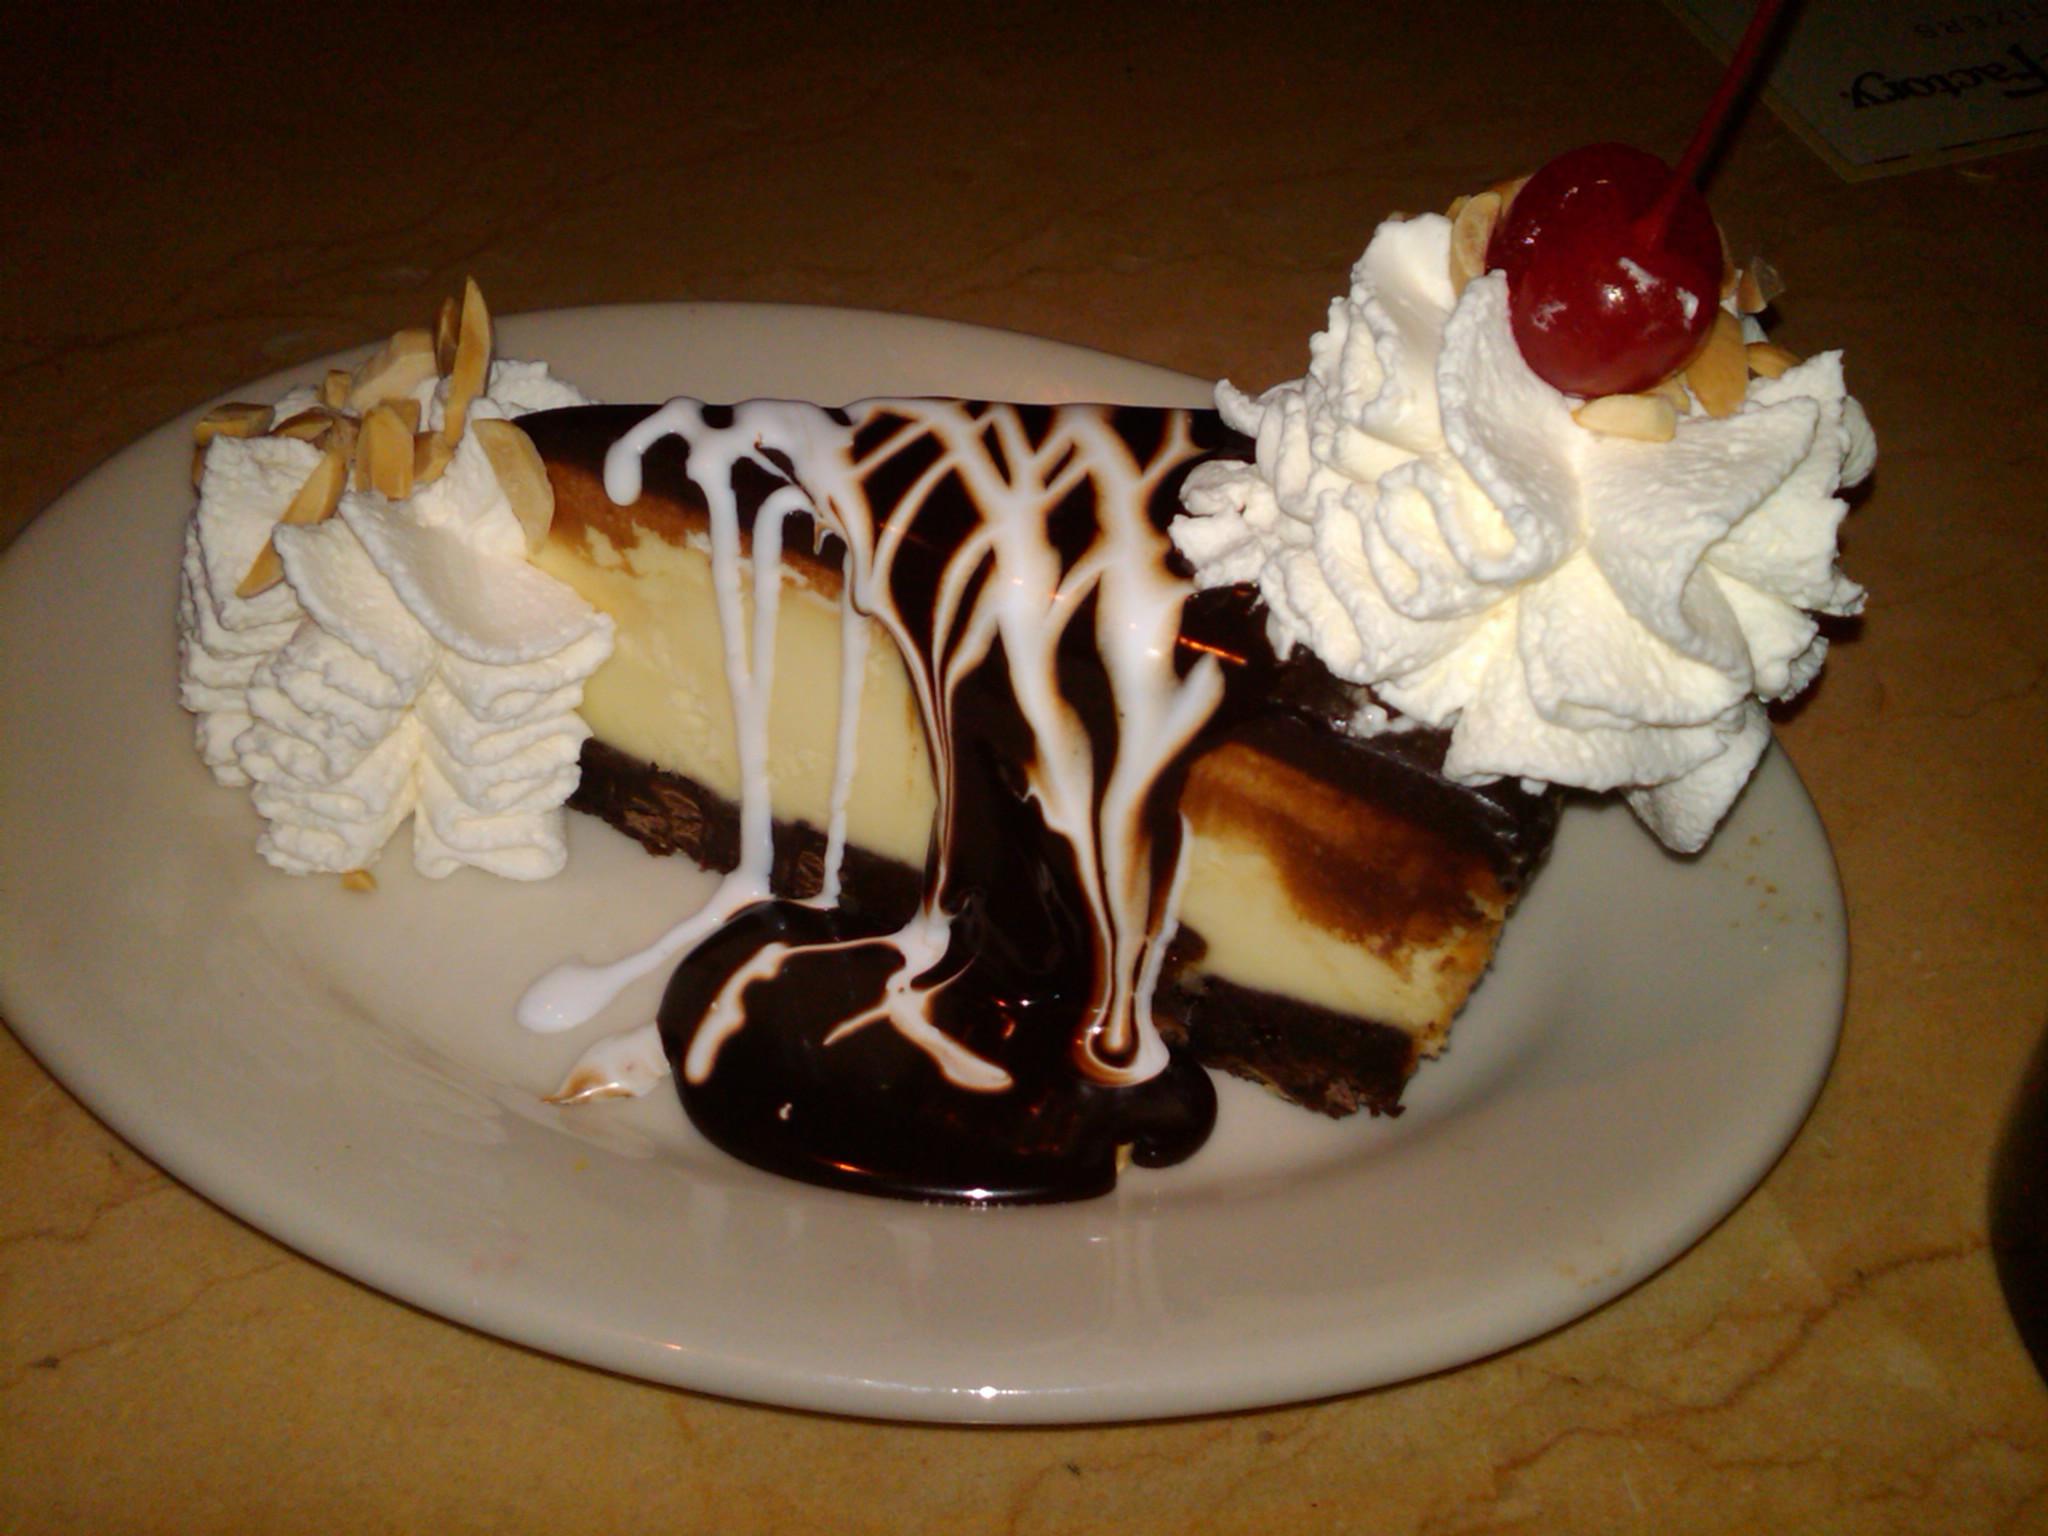 Cheesecake Factory Desserts  The Cheesecake Factory – A sneak peek